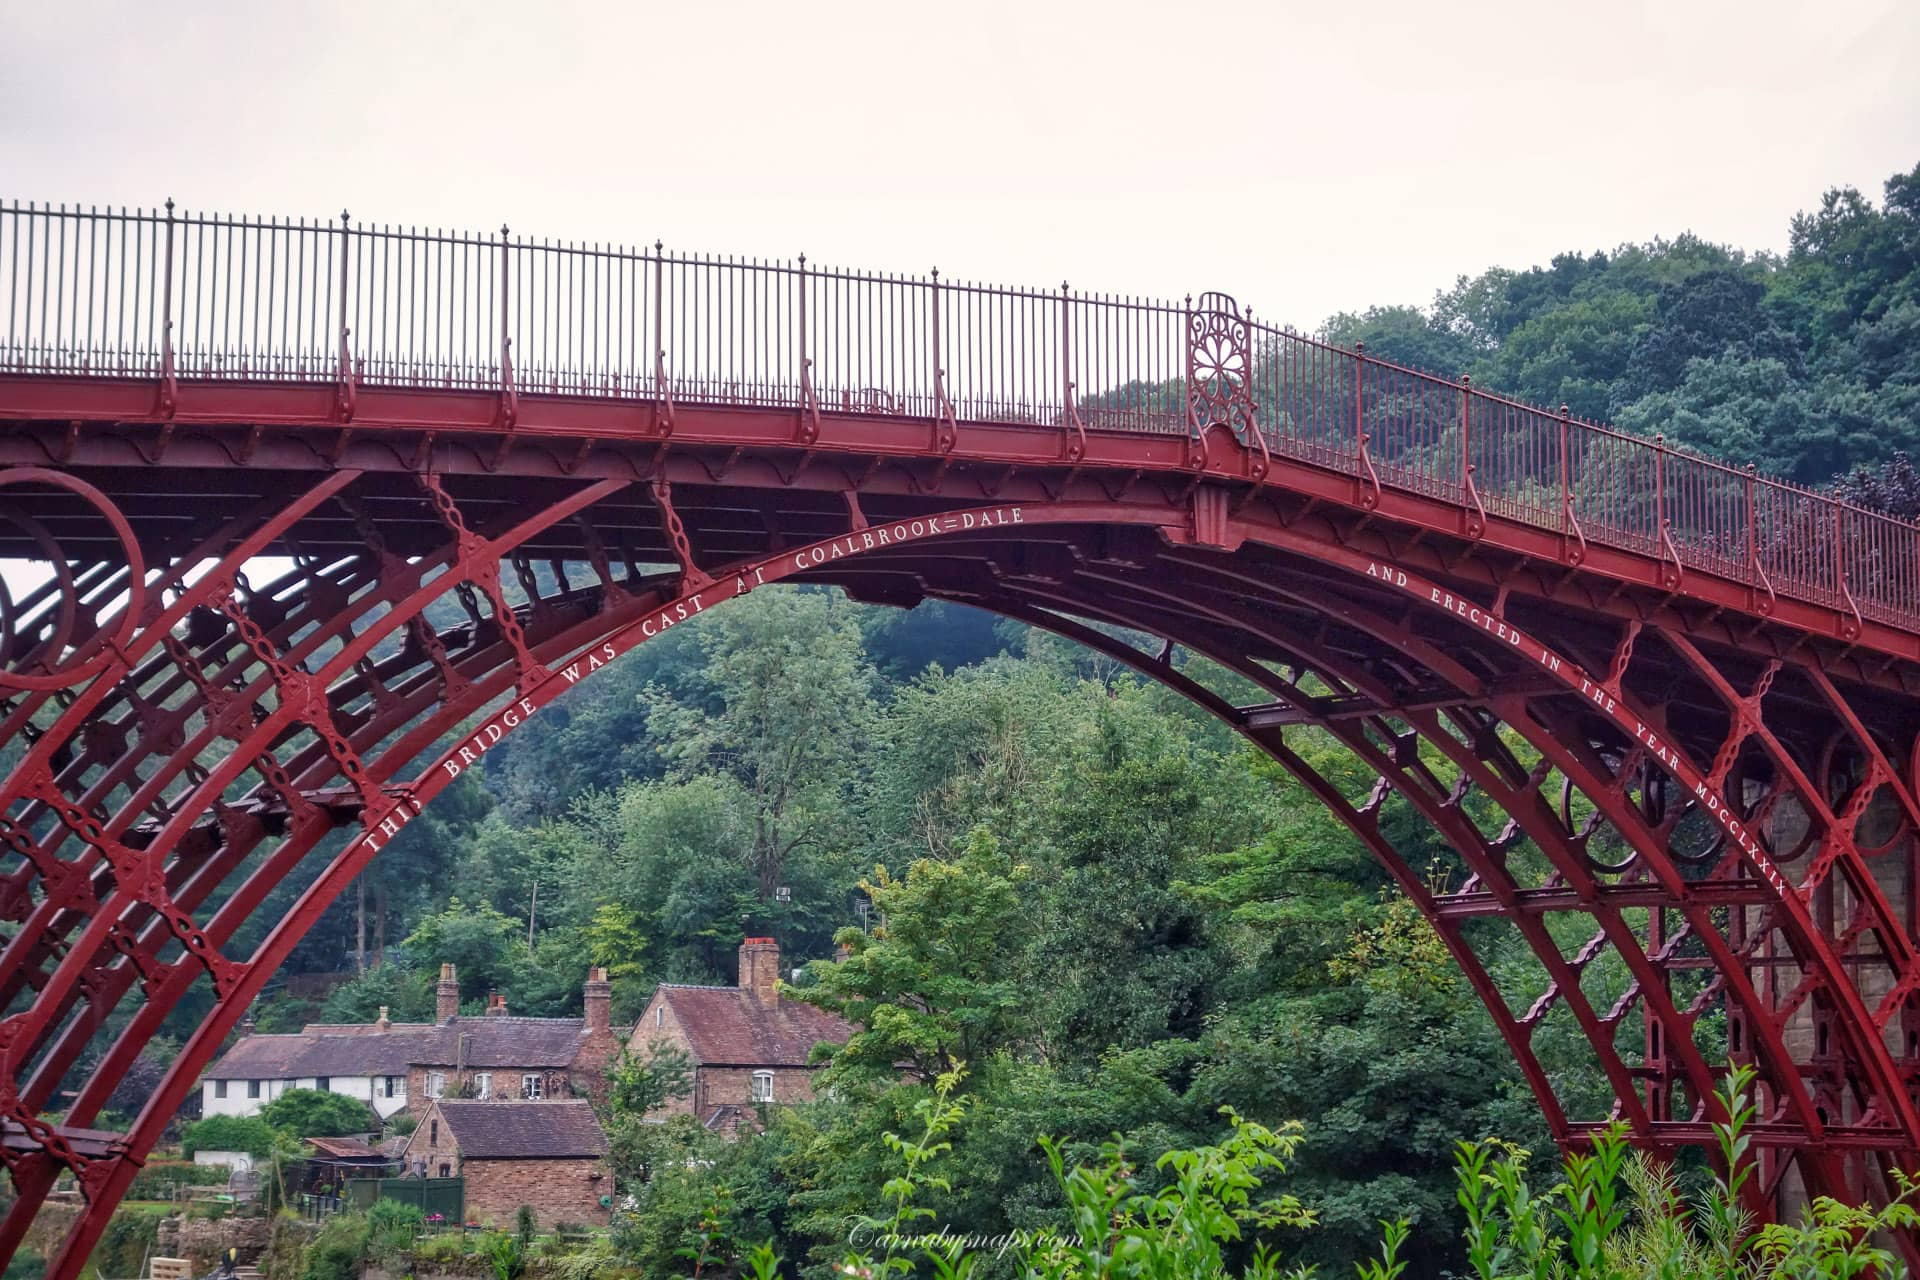 Coalbrookdale & The Iron Bridge, Telford & Ironbridge 3 Day Cycle Touring Trip: Part Three